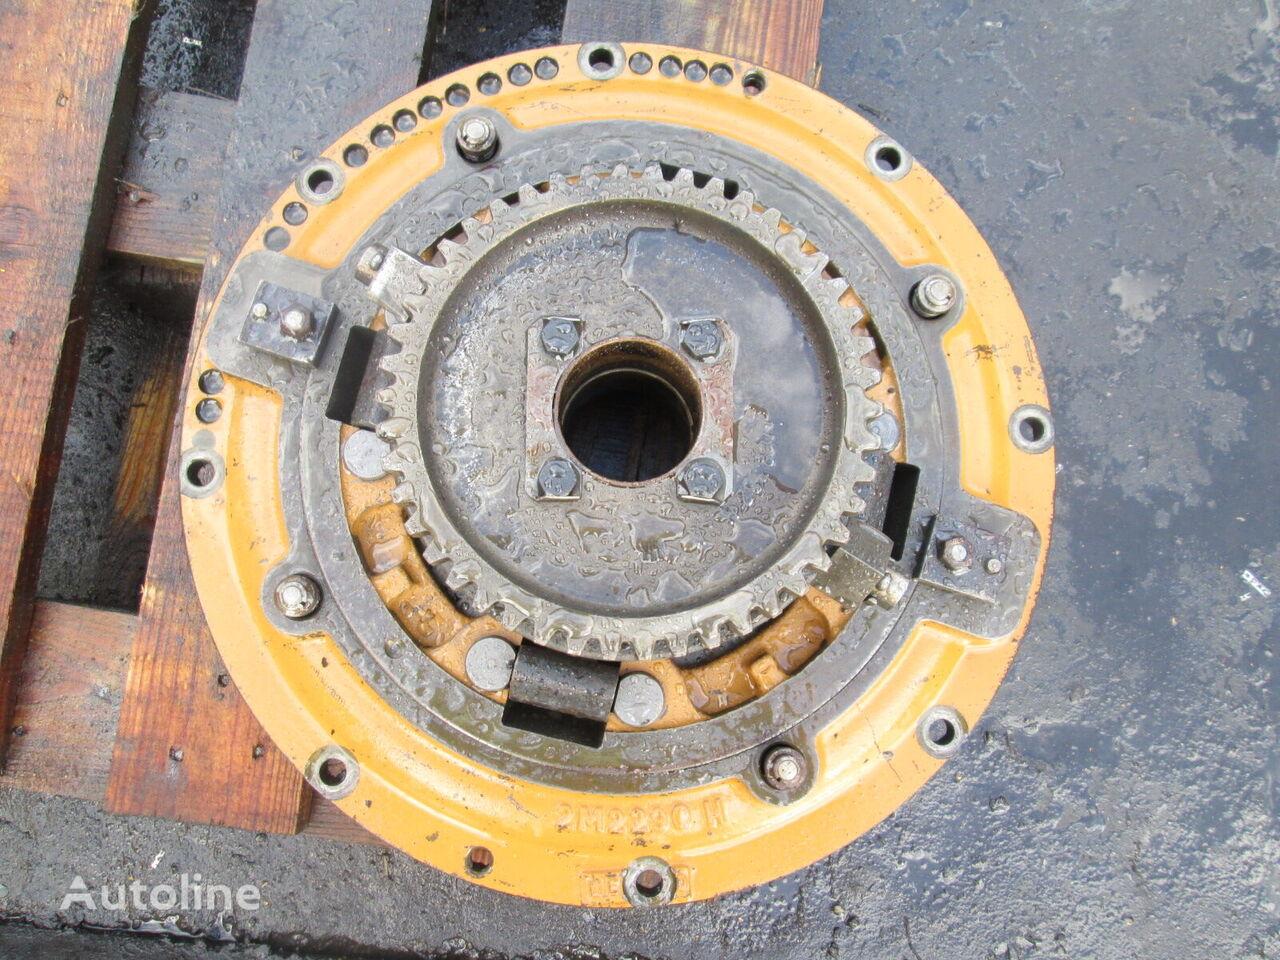 CATERPILLAR clutch for bulldozer